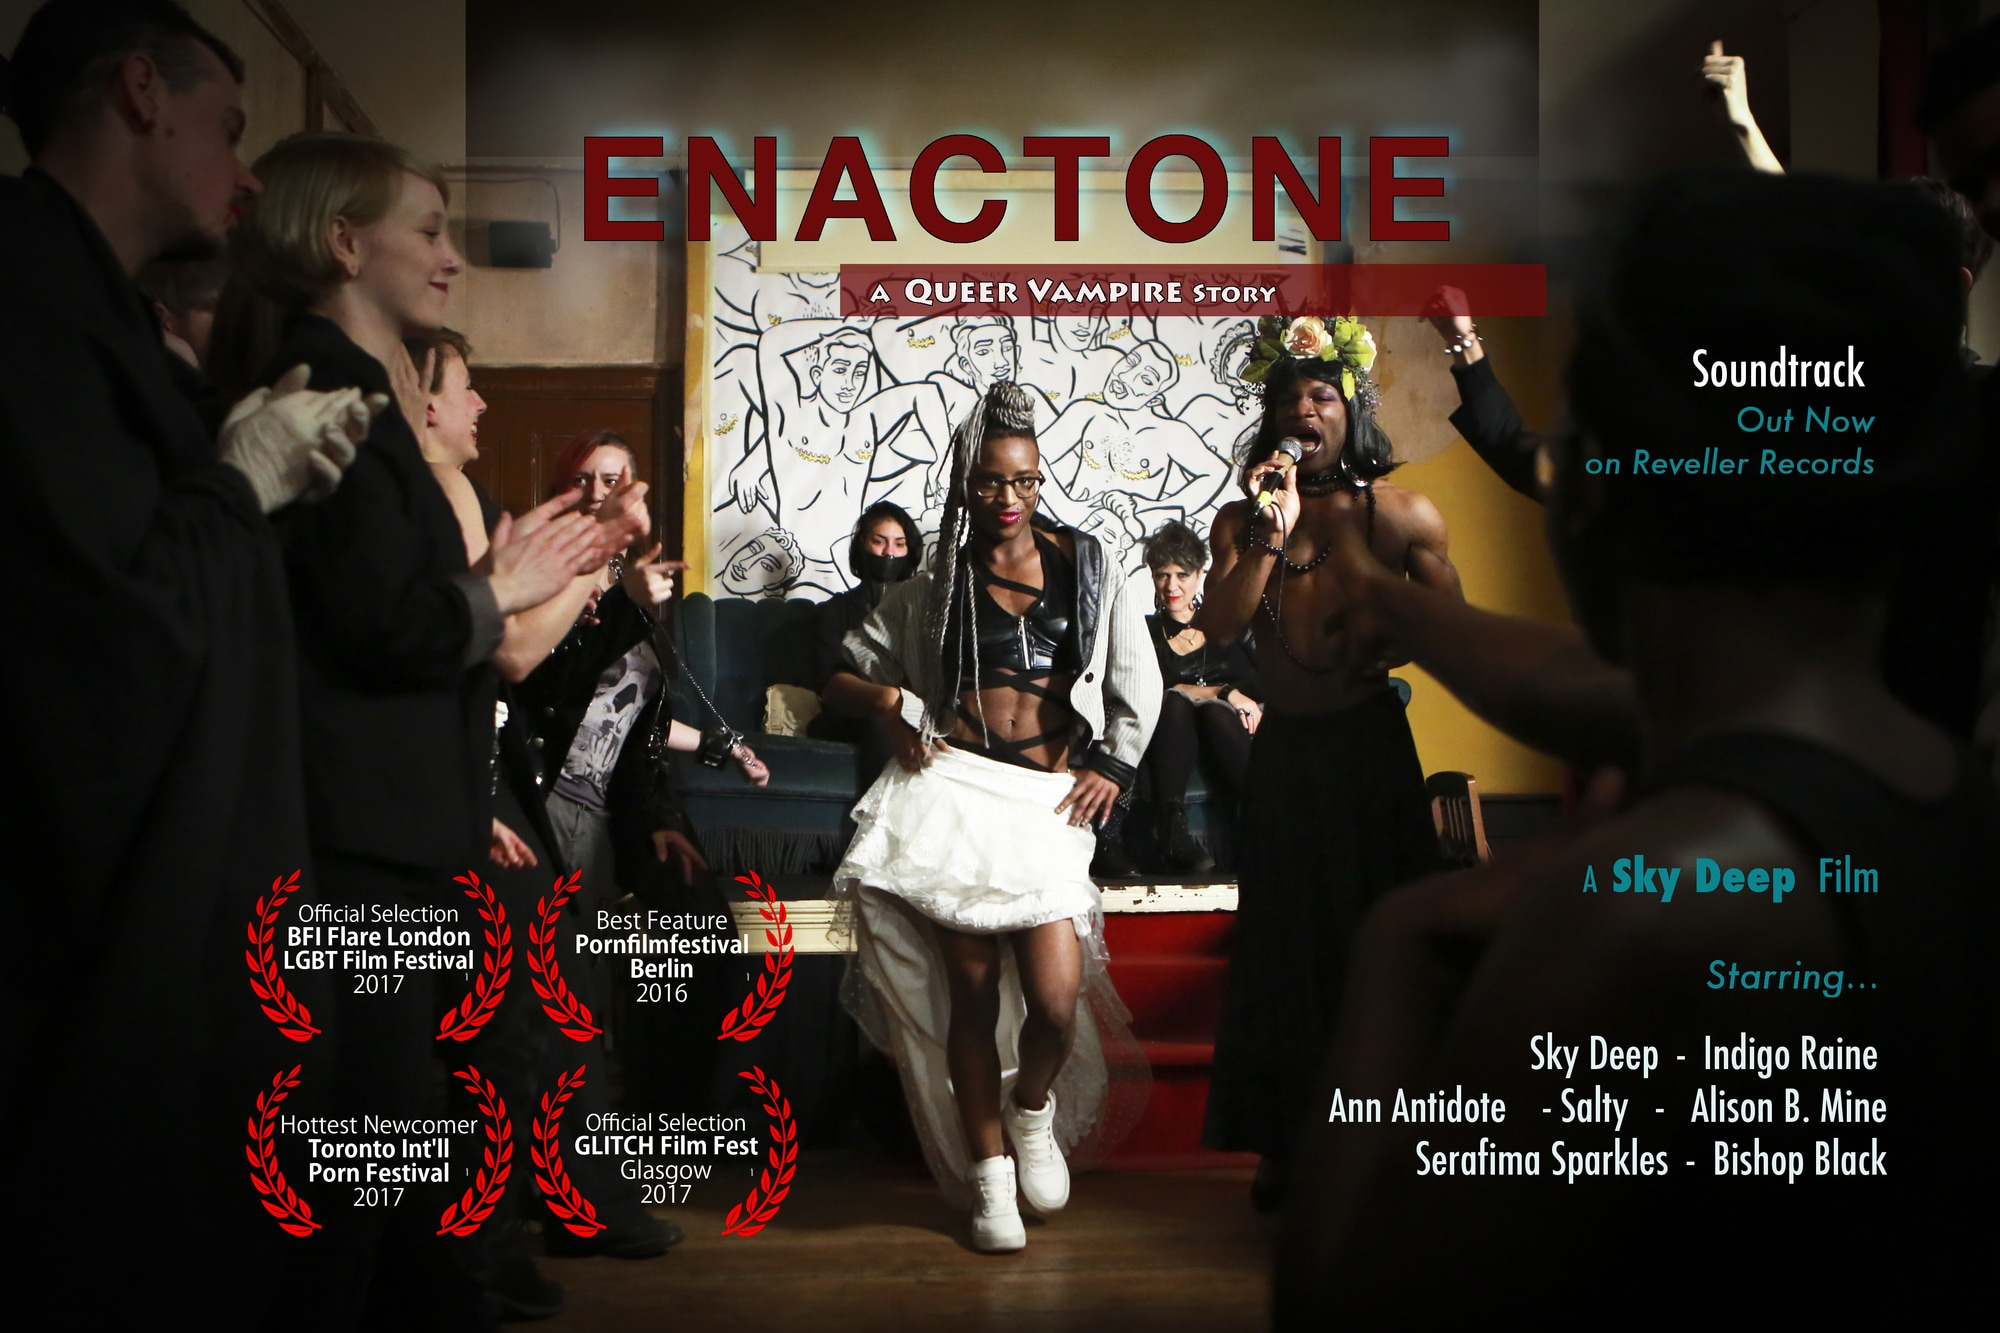 enactone movie poster